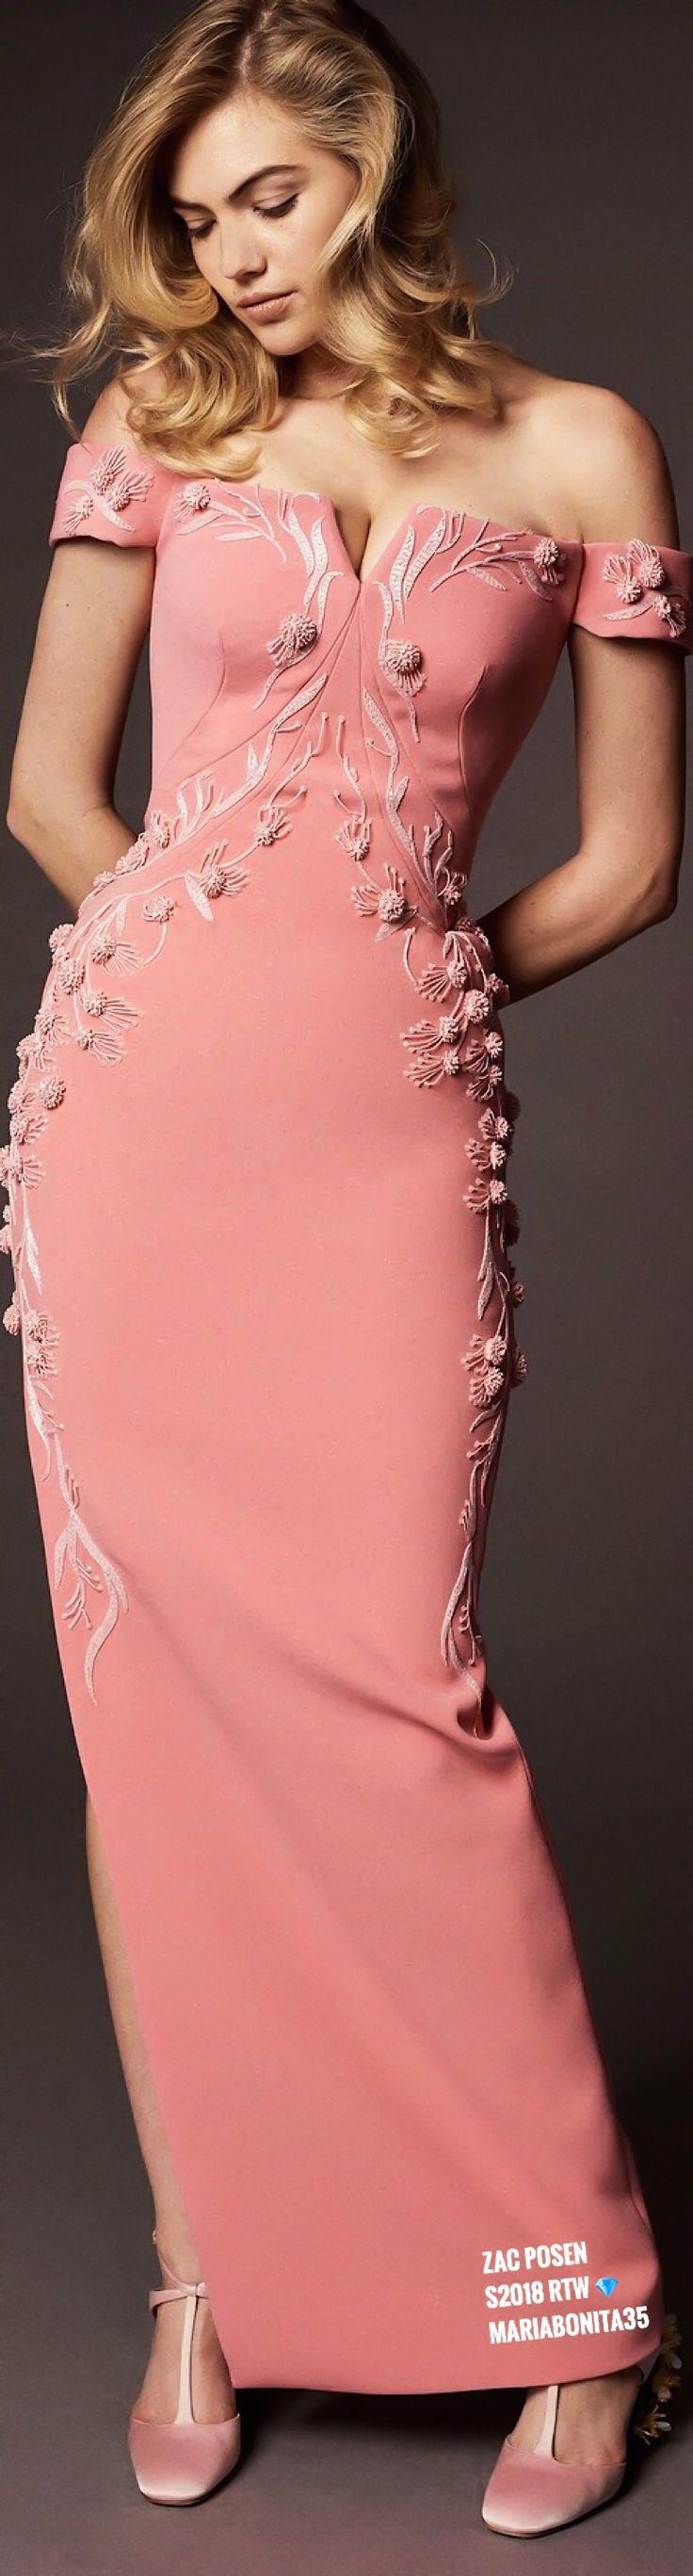 144 best Wedding dress images on Pinterest | Gown wedding, Wedding ...